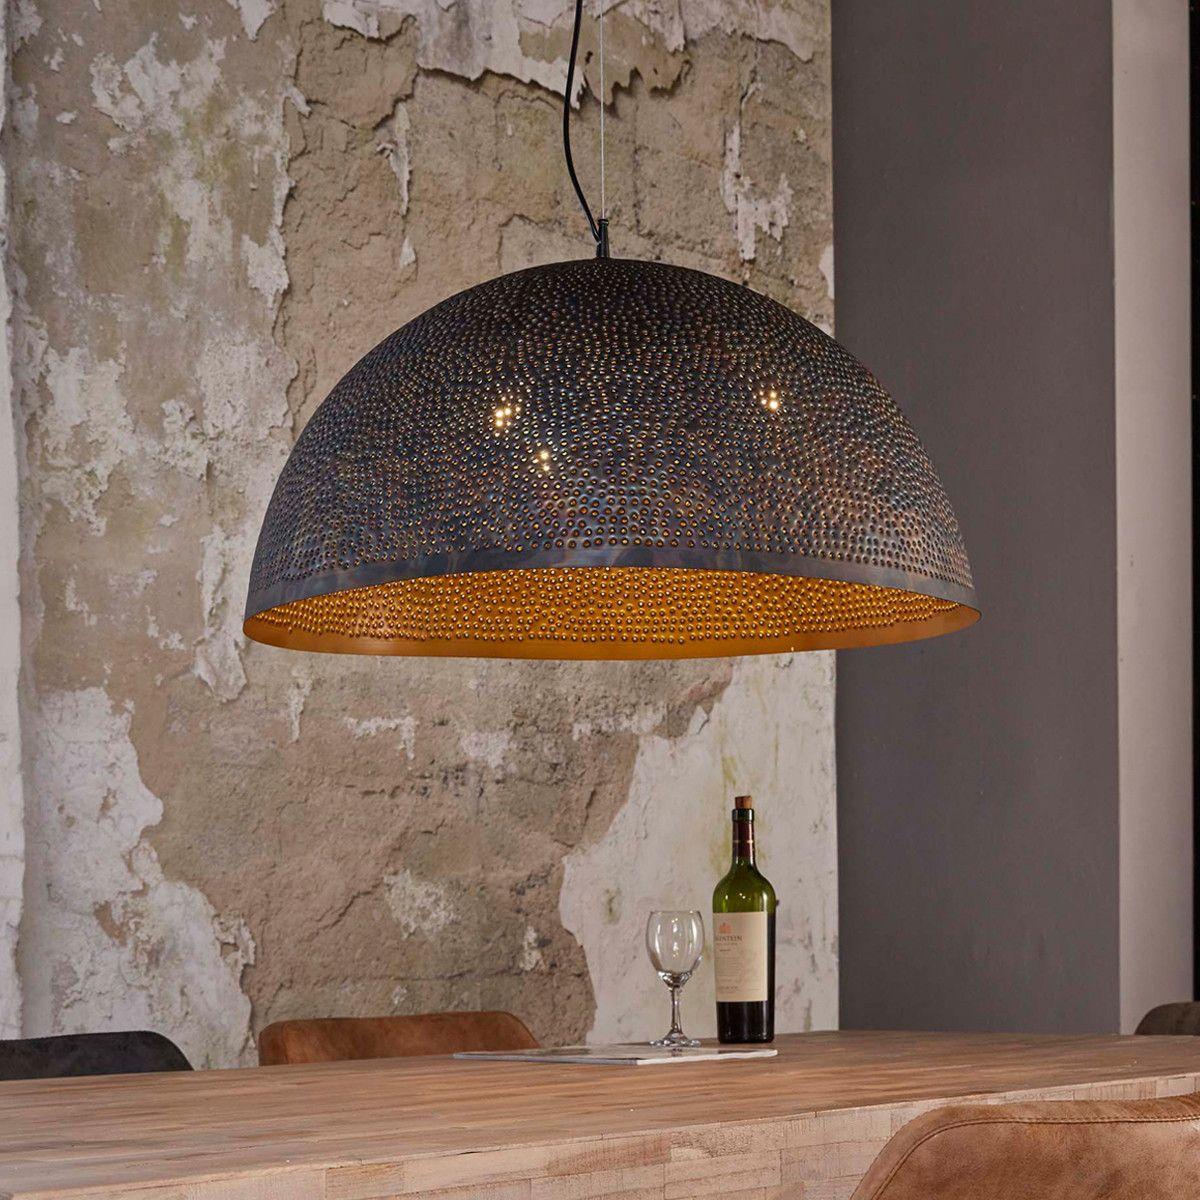 Industriele Hanglamp 1l Santa Punch In 2020 Industriele Hanglampen Hanglamp Eetkamertafel Lamp